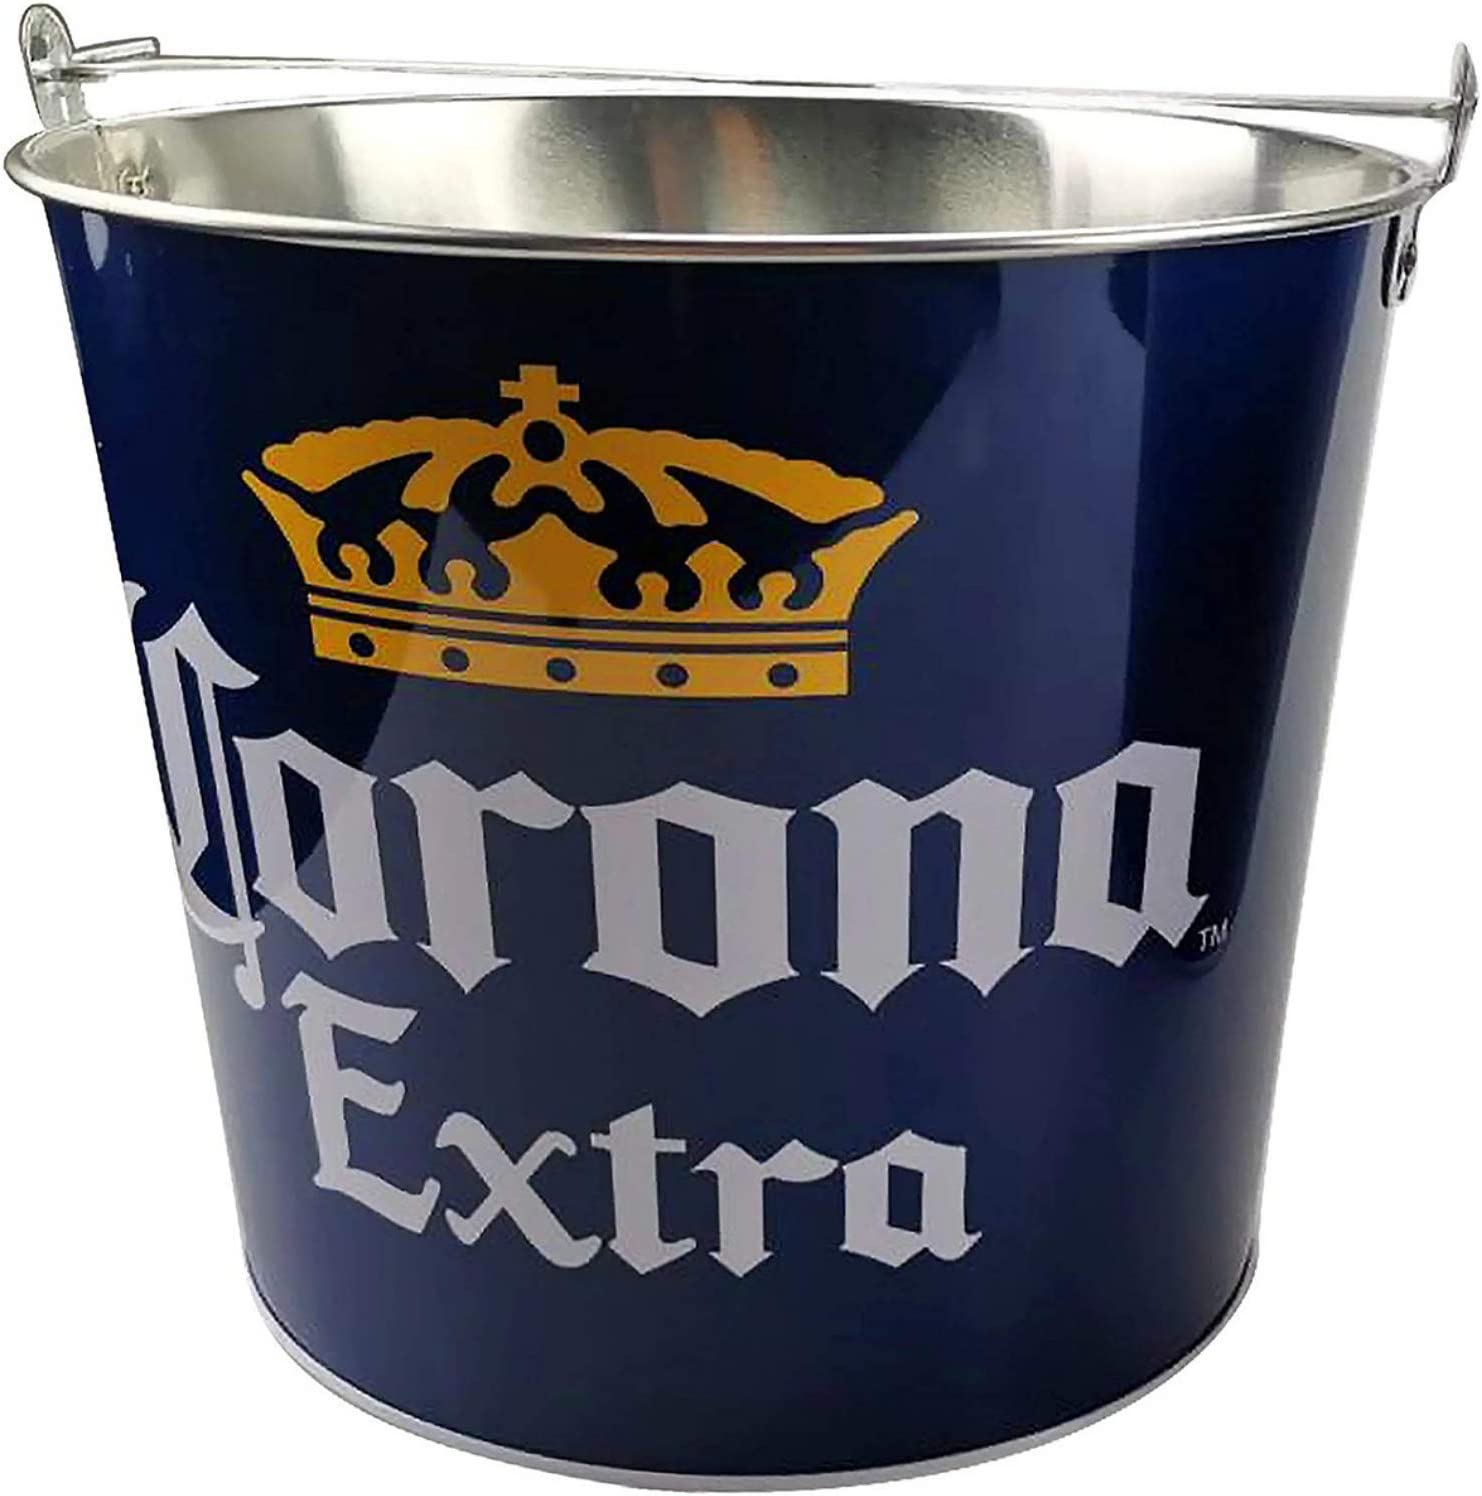 Silver Buffalo Corona Extra 5qt Round Metal Bucket, 5-Quart, Blue